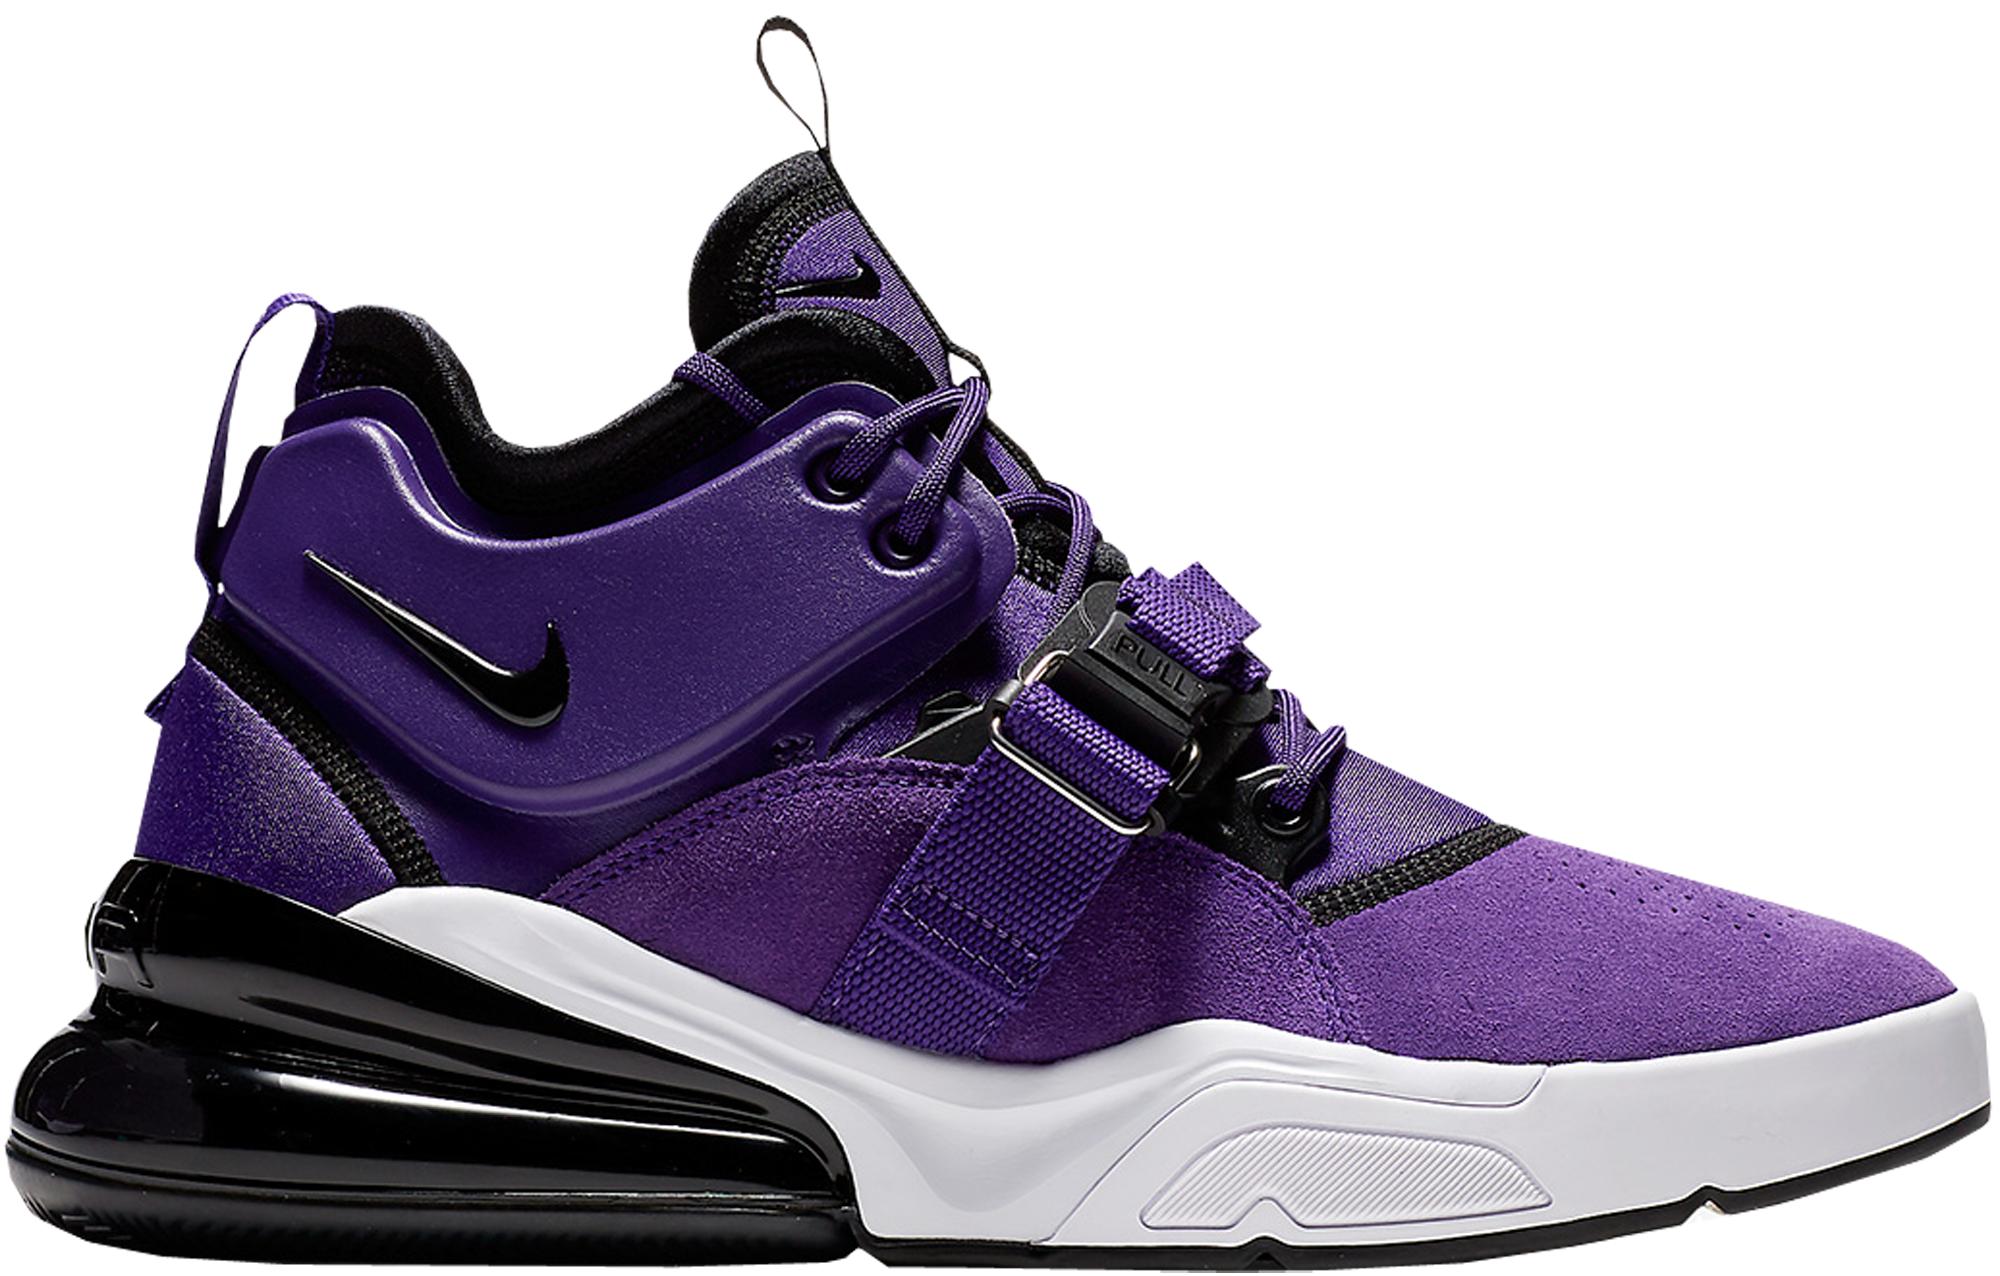 13861b9be2c0 Nike air force court purple png 1400x1000 Purple nike 270